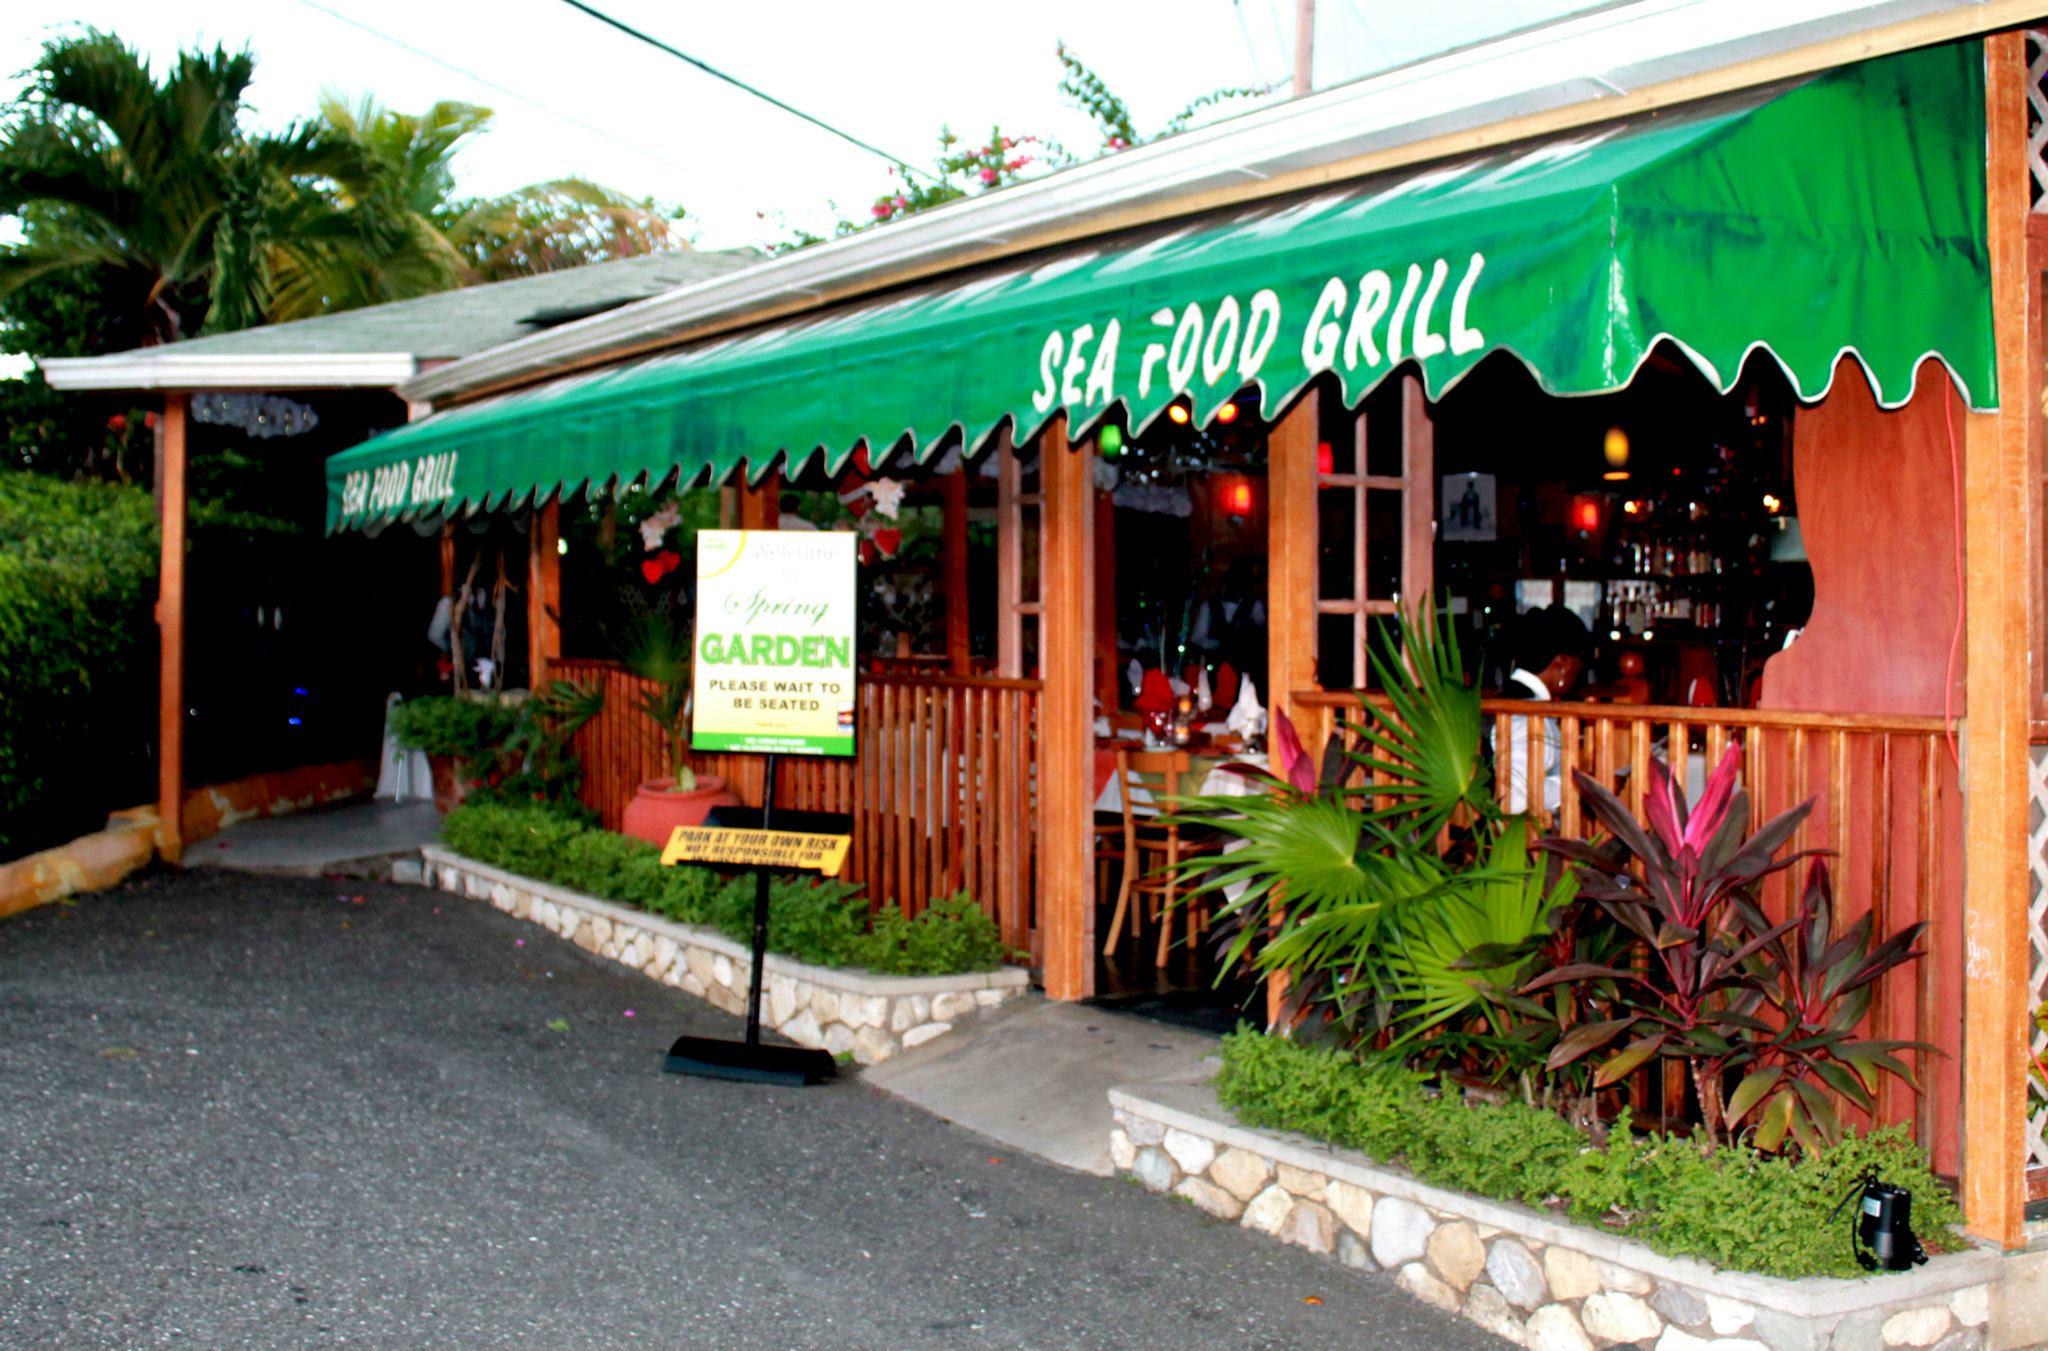 restaurants in ocho rios 2400, best restaurants in ocho rios 170, ocho rios food, where to eat in ocho rios, Spring Garden Seafood & Steakhouse